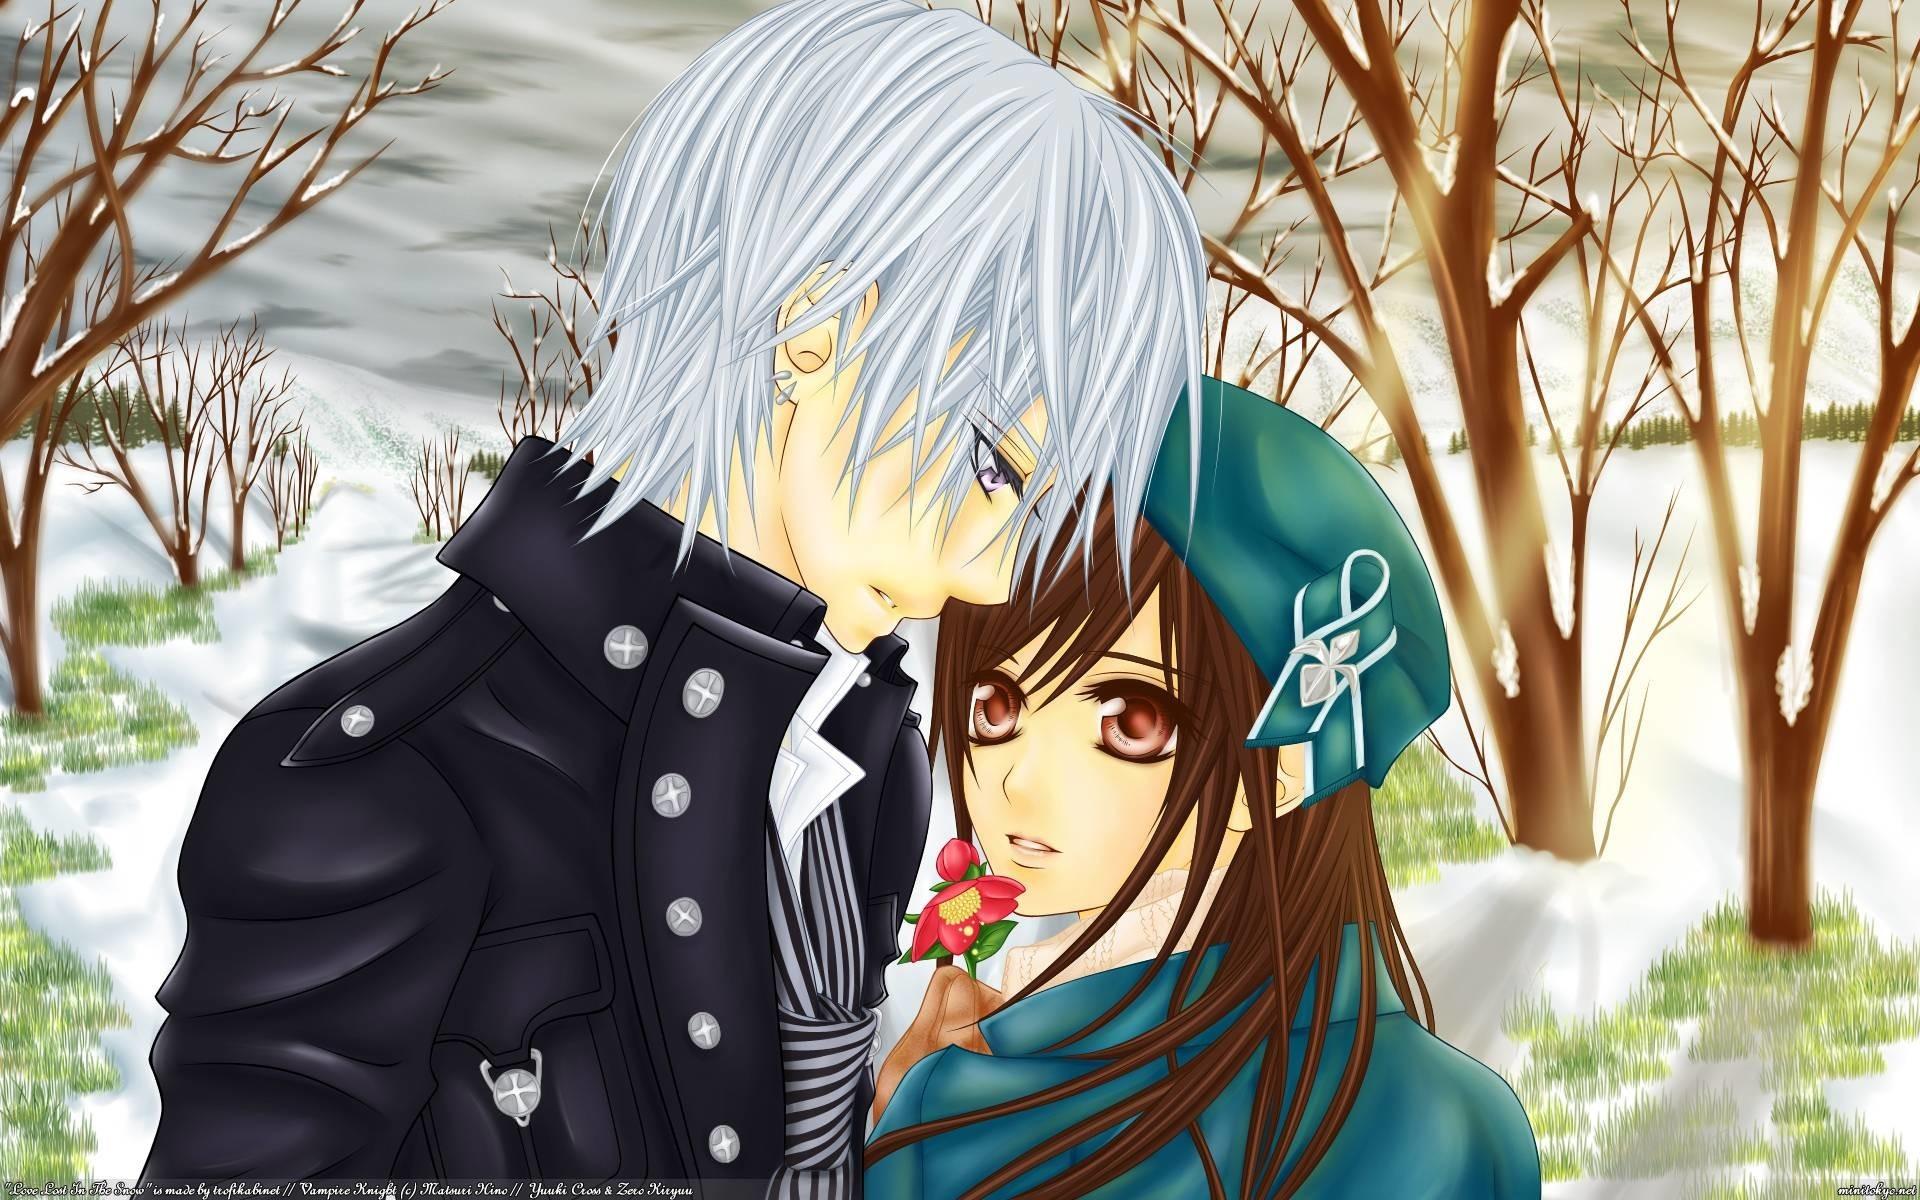 Res: 1920x1200, 1920x1080 Nice Couple Cartoon Wallpaper | 3D Anime Couple Wallpapers |  Pinterest | Romantic anime couples, Happy hug day and Couple cartoon